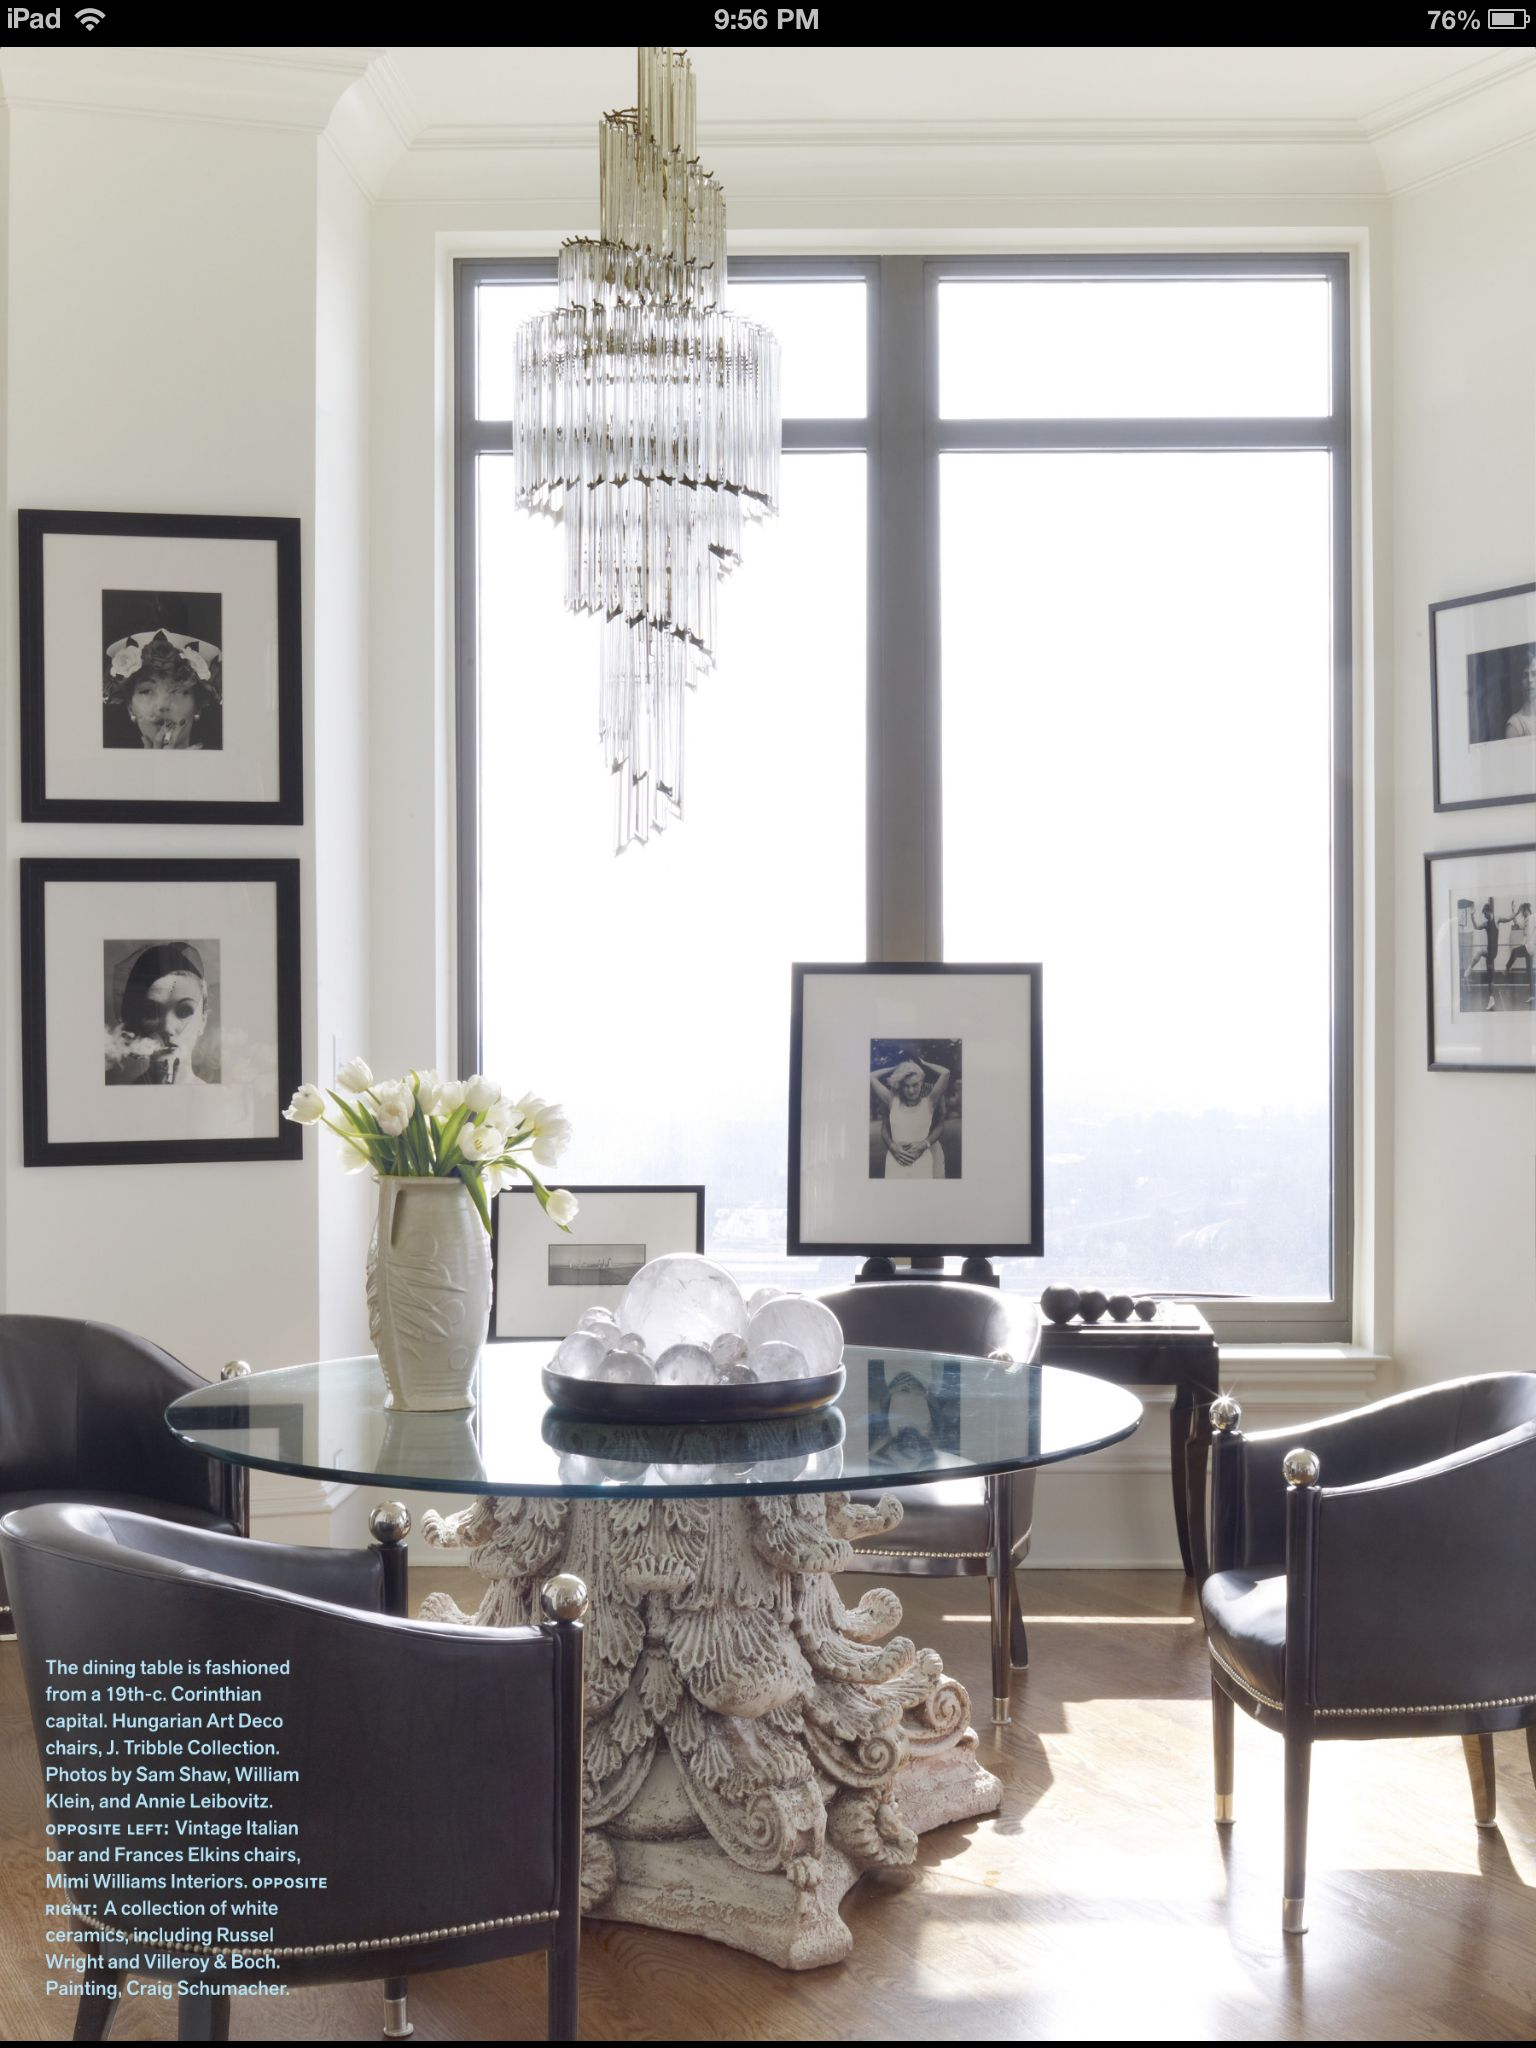 Luxury Showcase For Living Room Royal Art Deco: White Apartment Decor, Interior Design